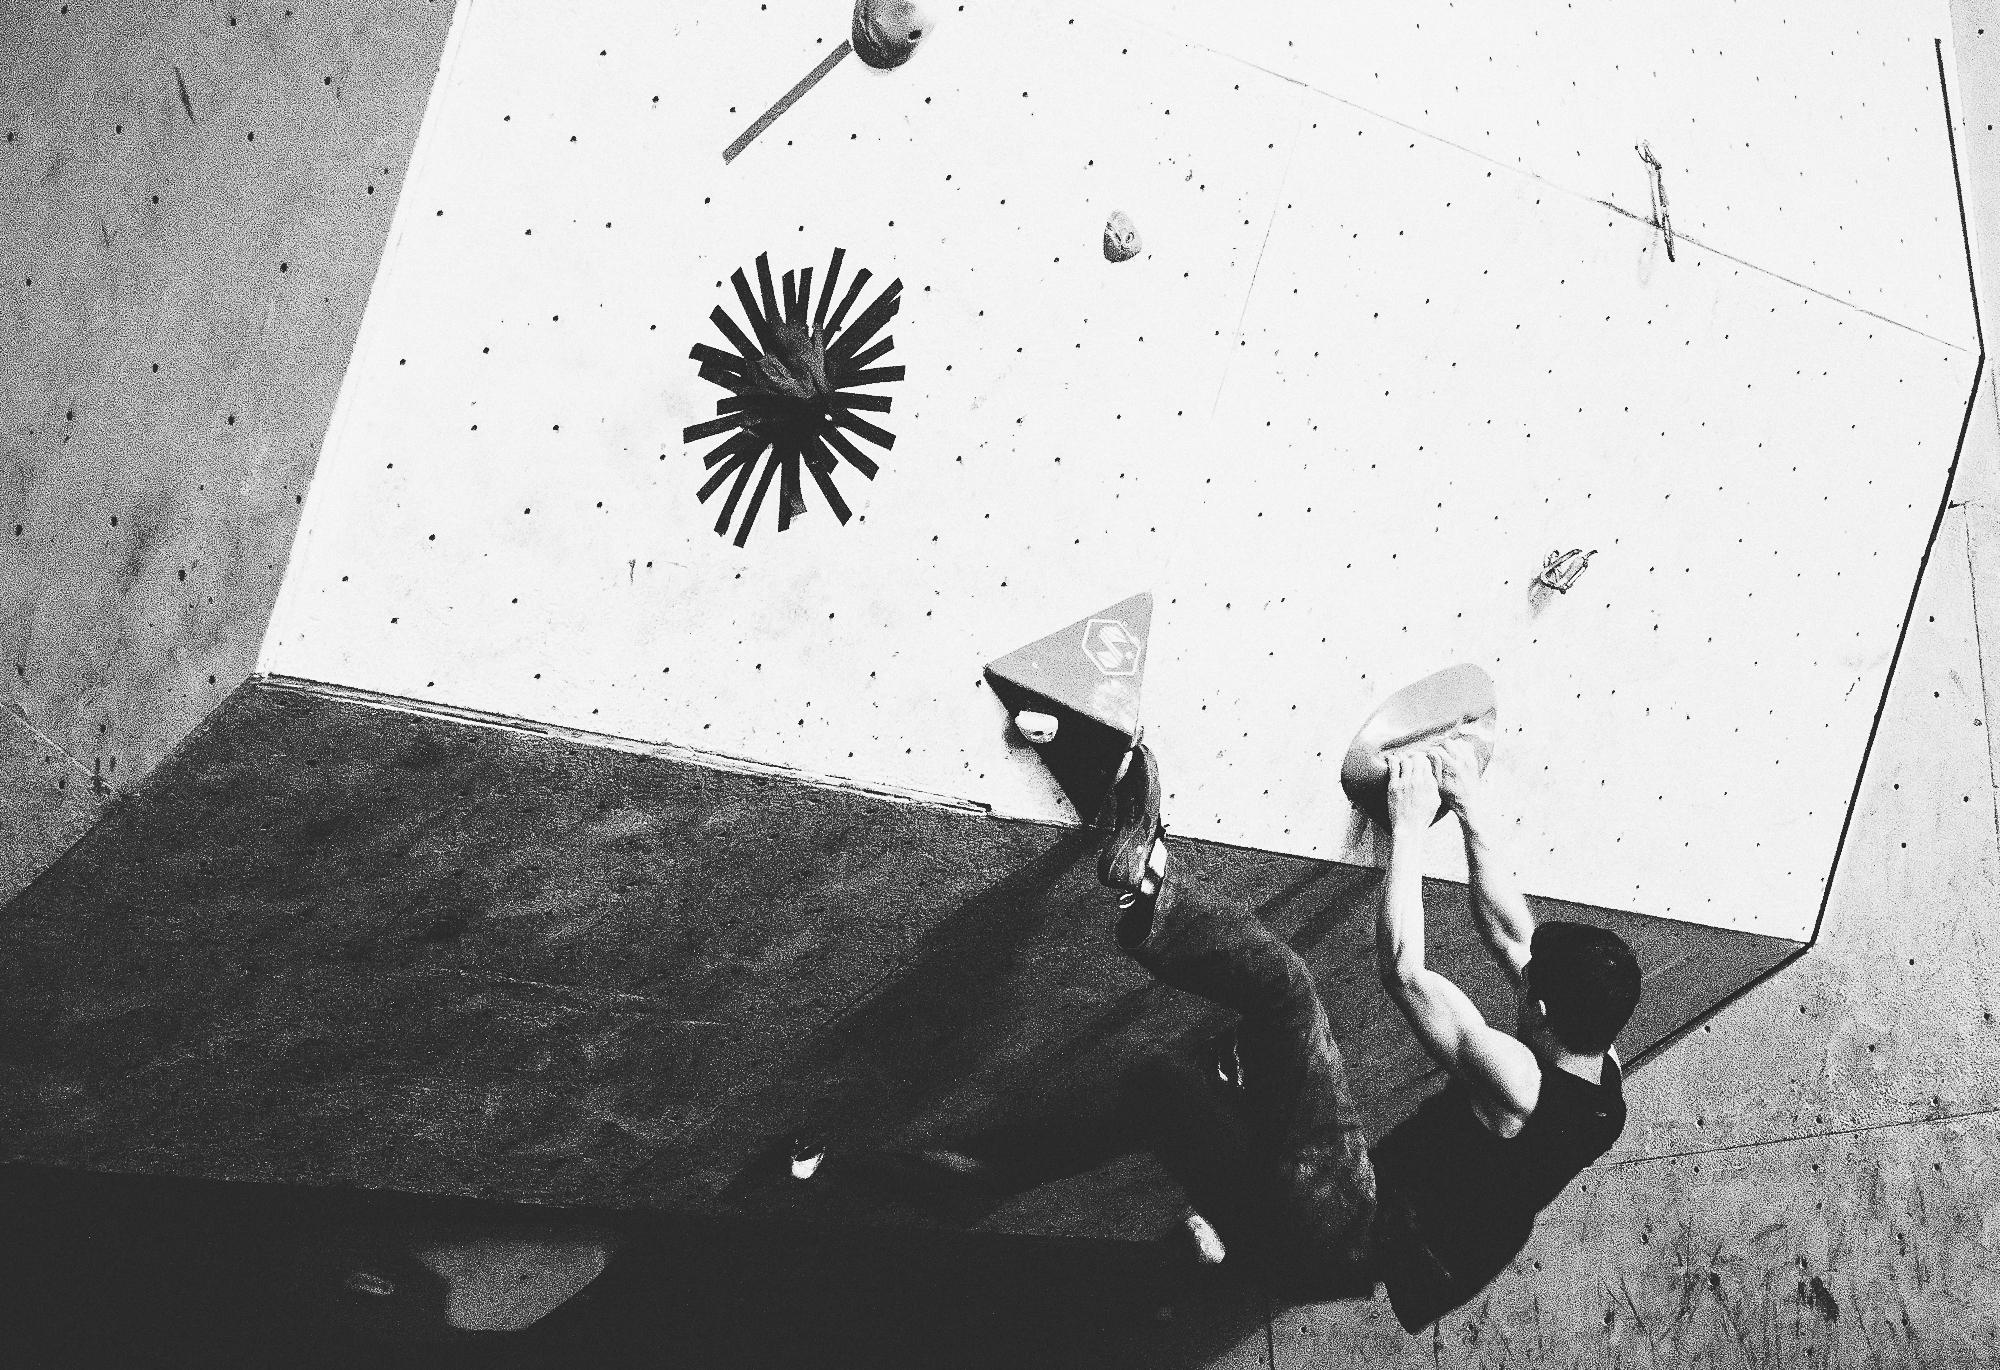 Climber Seb Lazure at a recent TdB Competition Climbing Men's Open Finals - Coyote Rock Gym